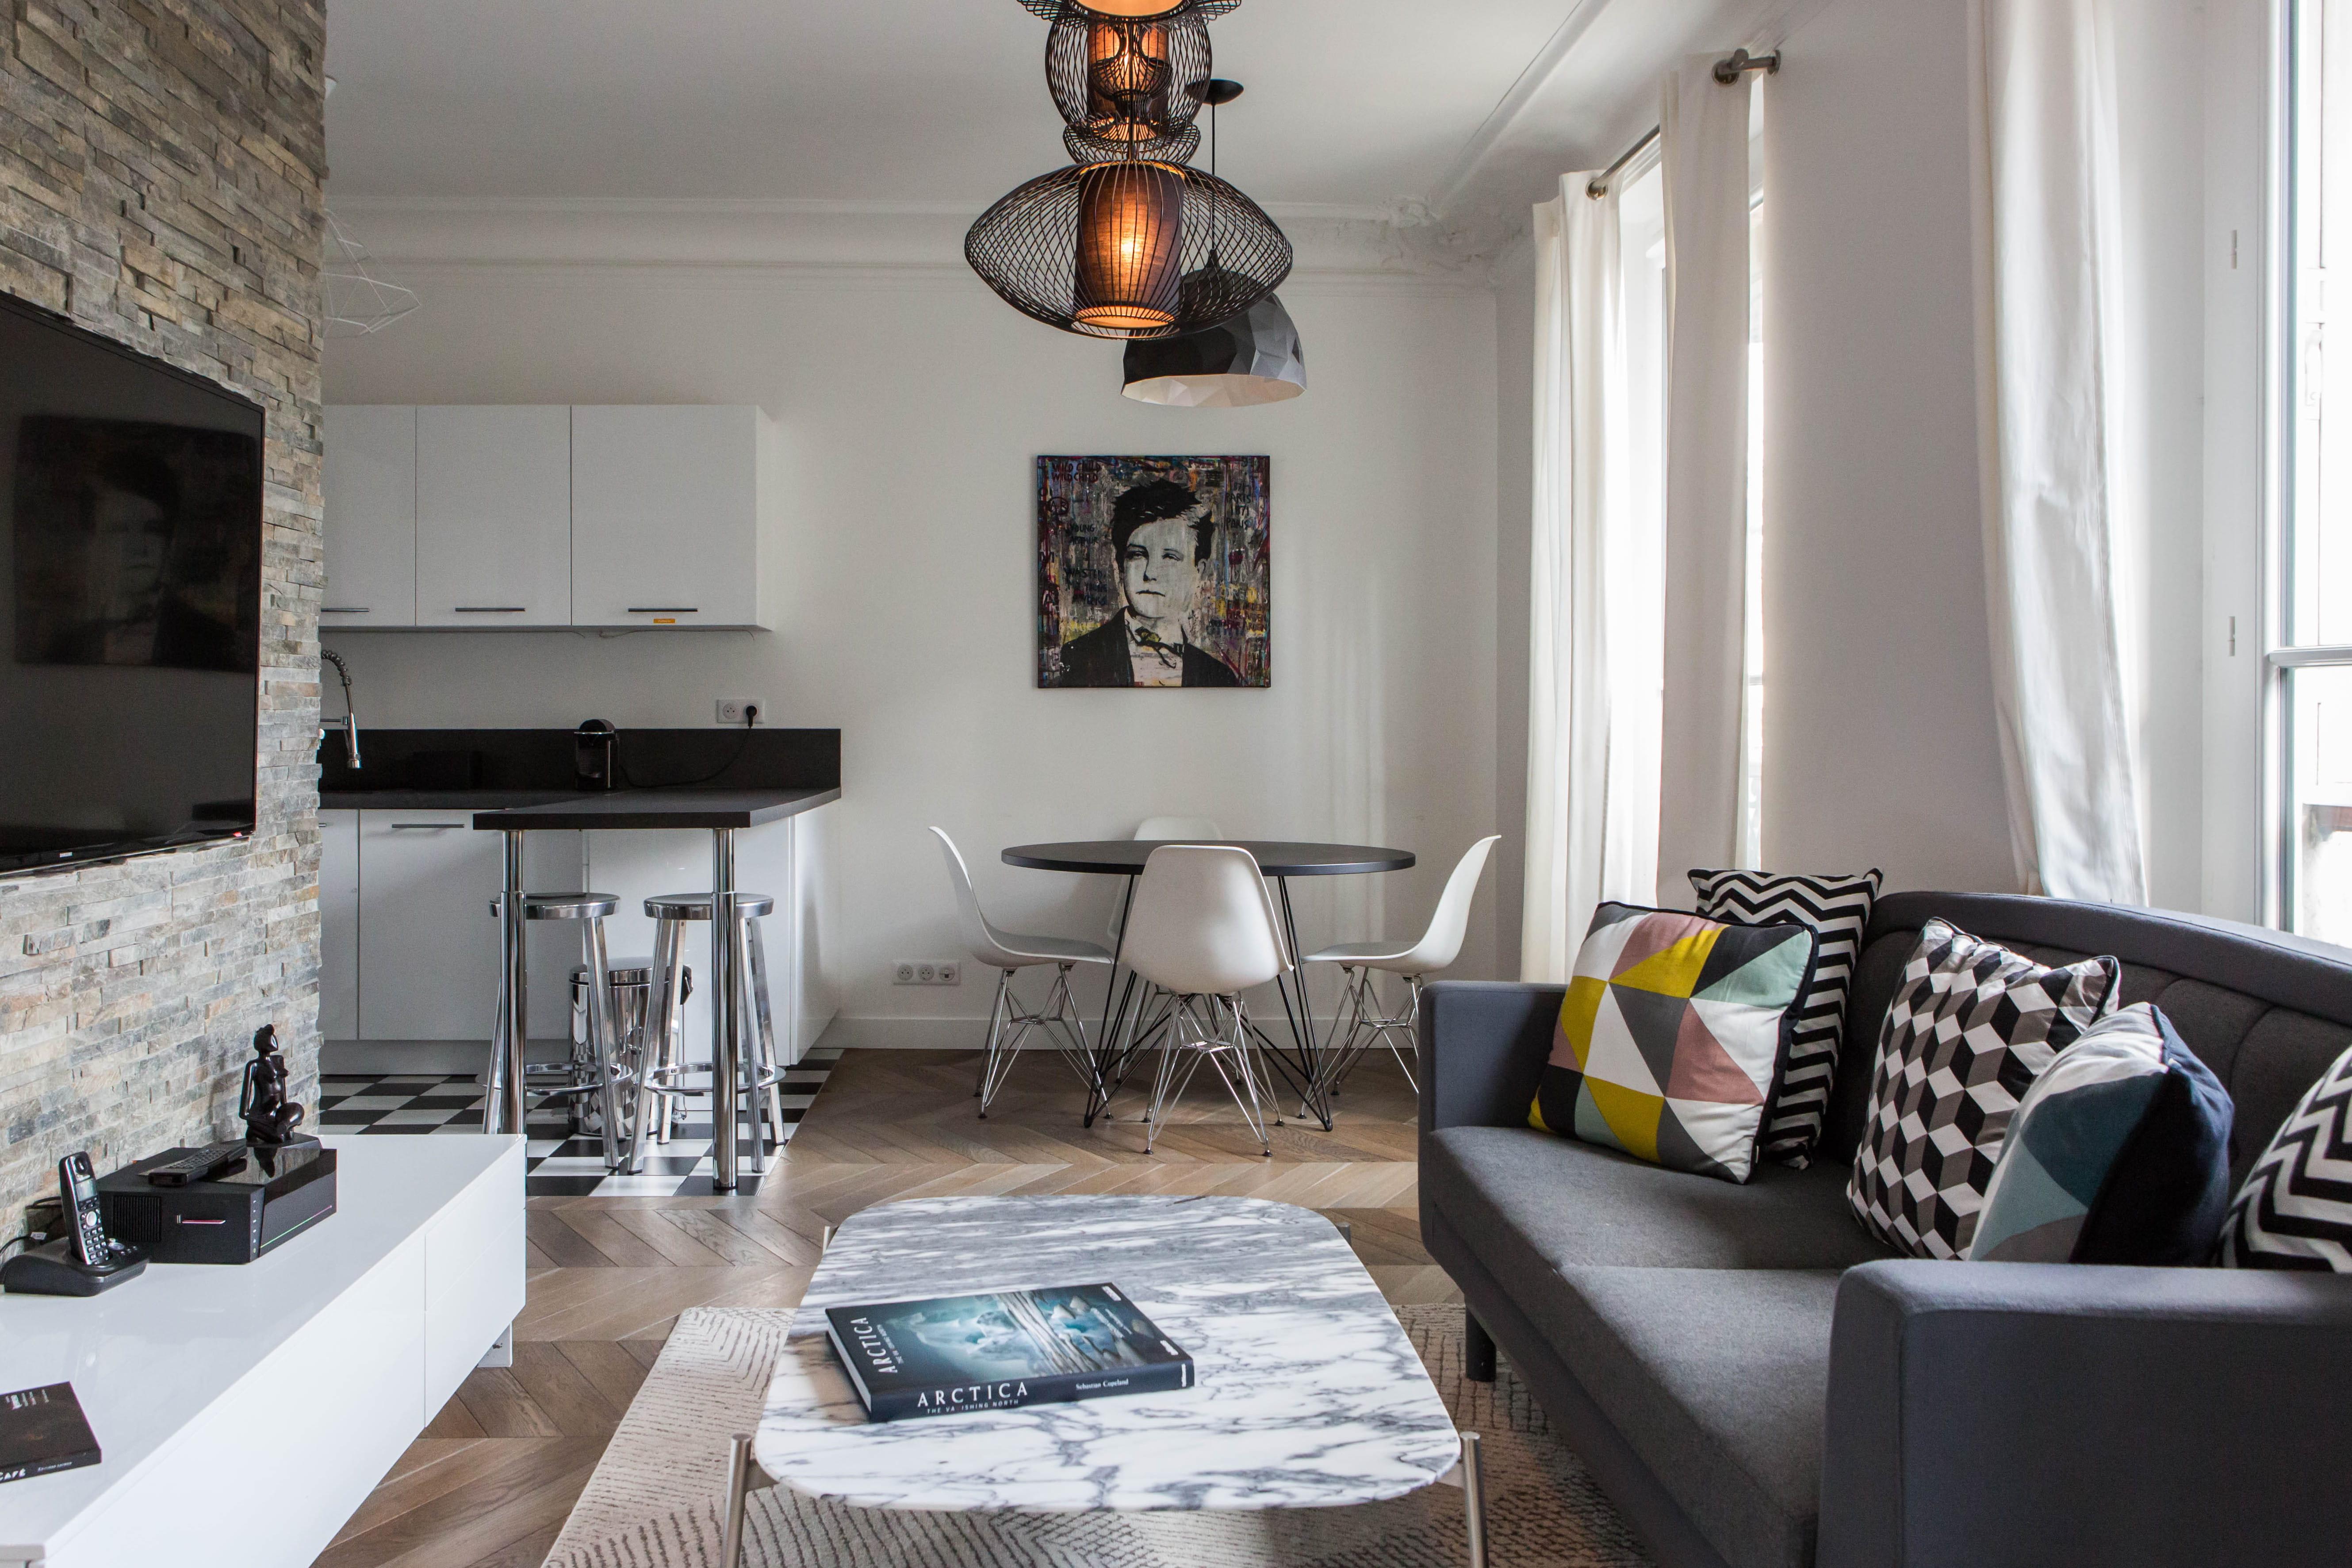 Idee deco salon salle a manger cuisine - Petit salon salle a manger ...